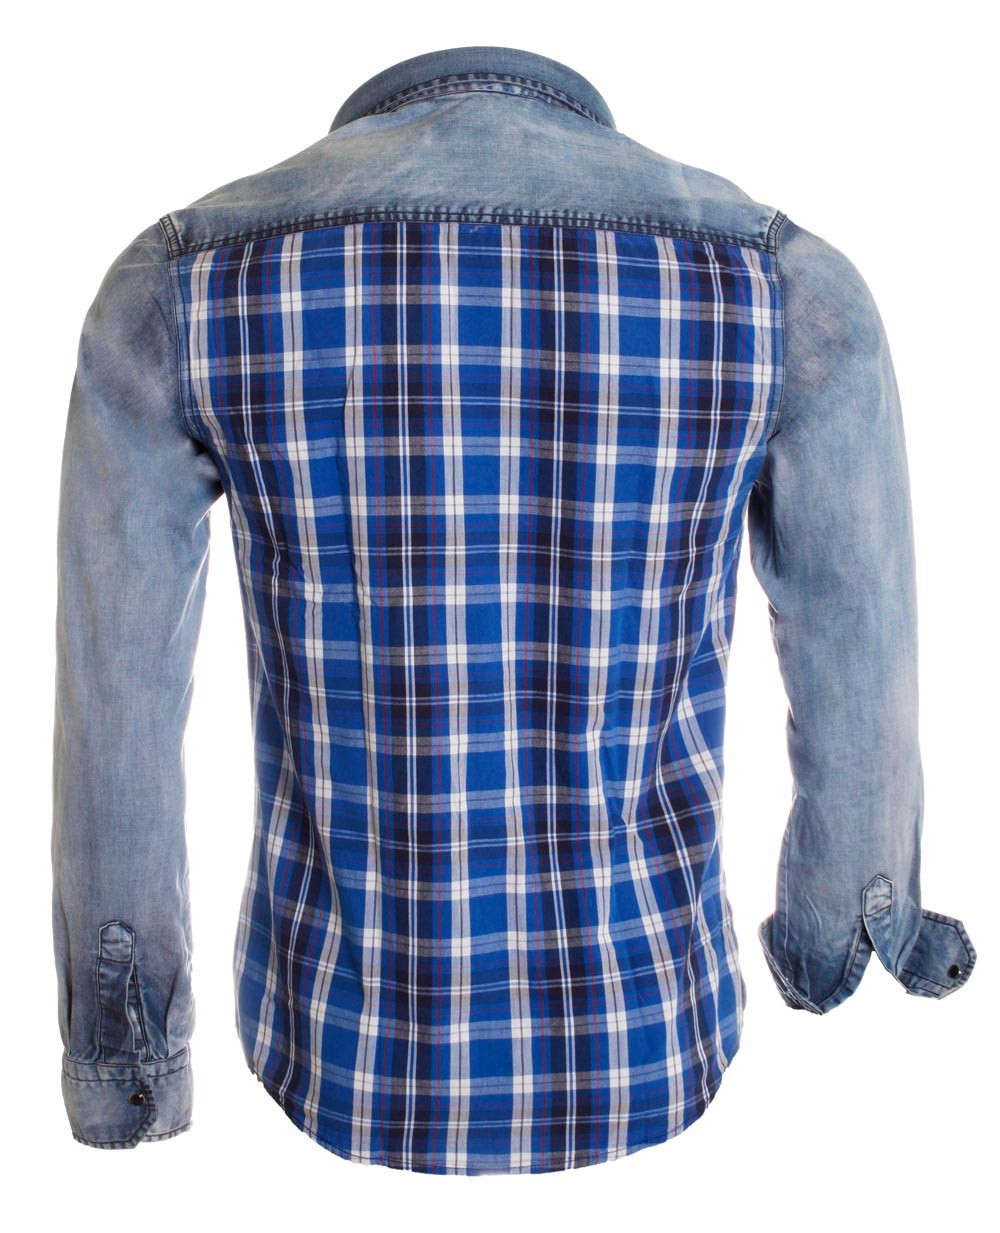 young rich herren karo jeans hemd 34 6118 vintage holzf ller look slimfit herren oberteile hemden. Black Bedroom Furniture Sets. Home Design Ideas